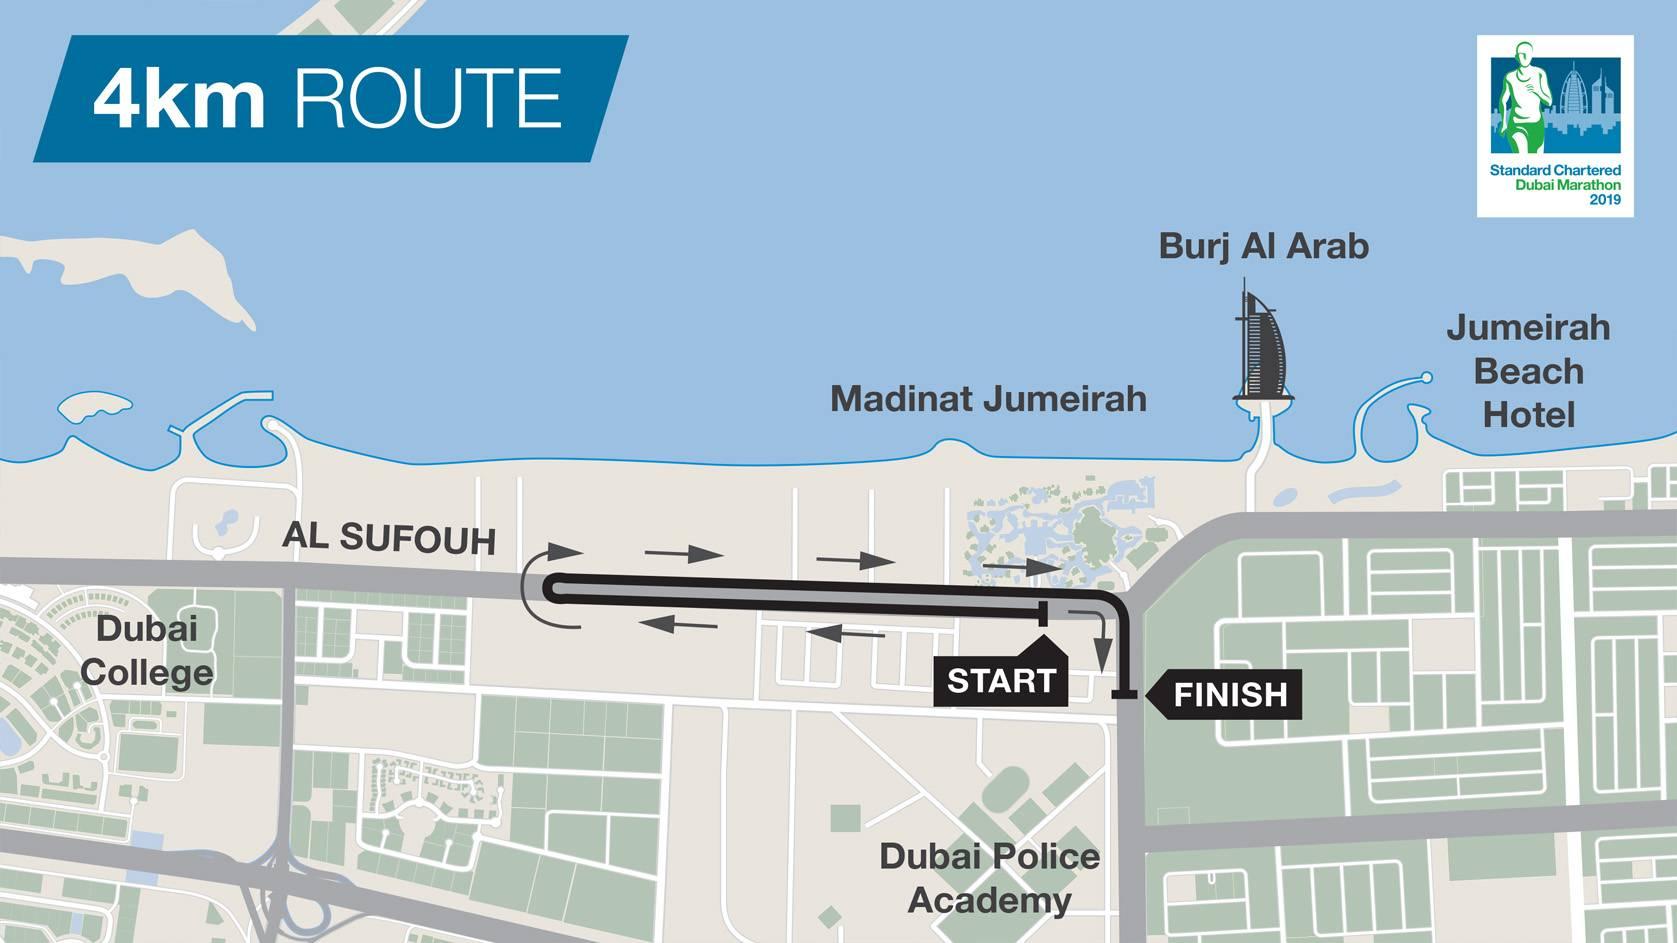 4km-route-2019.jpg